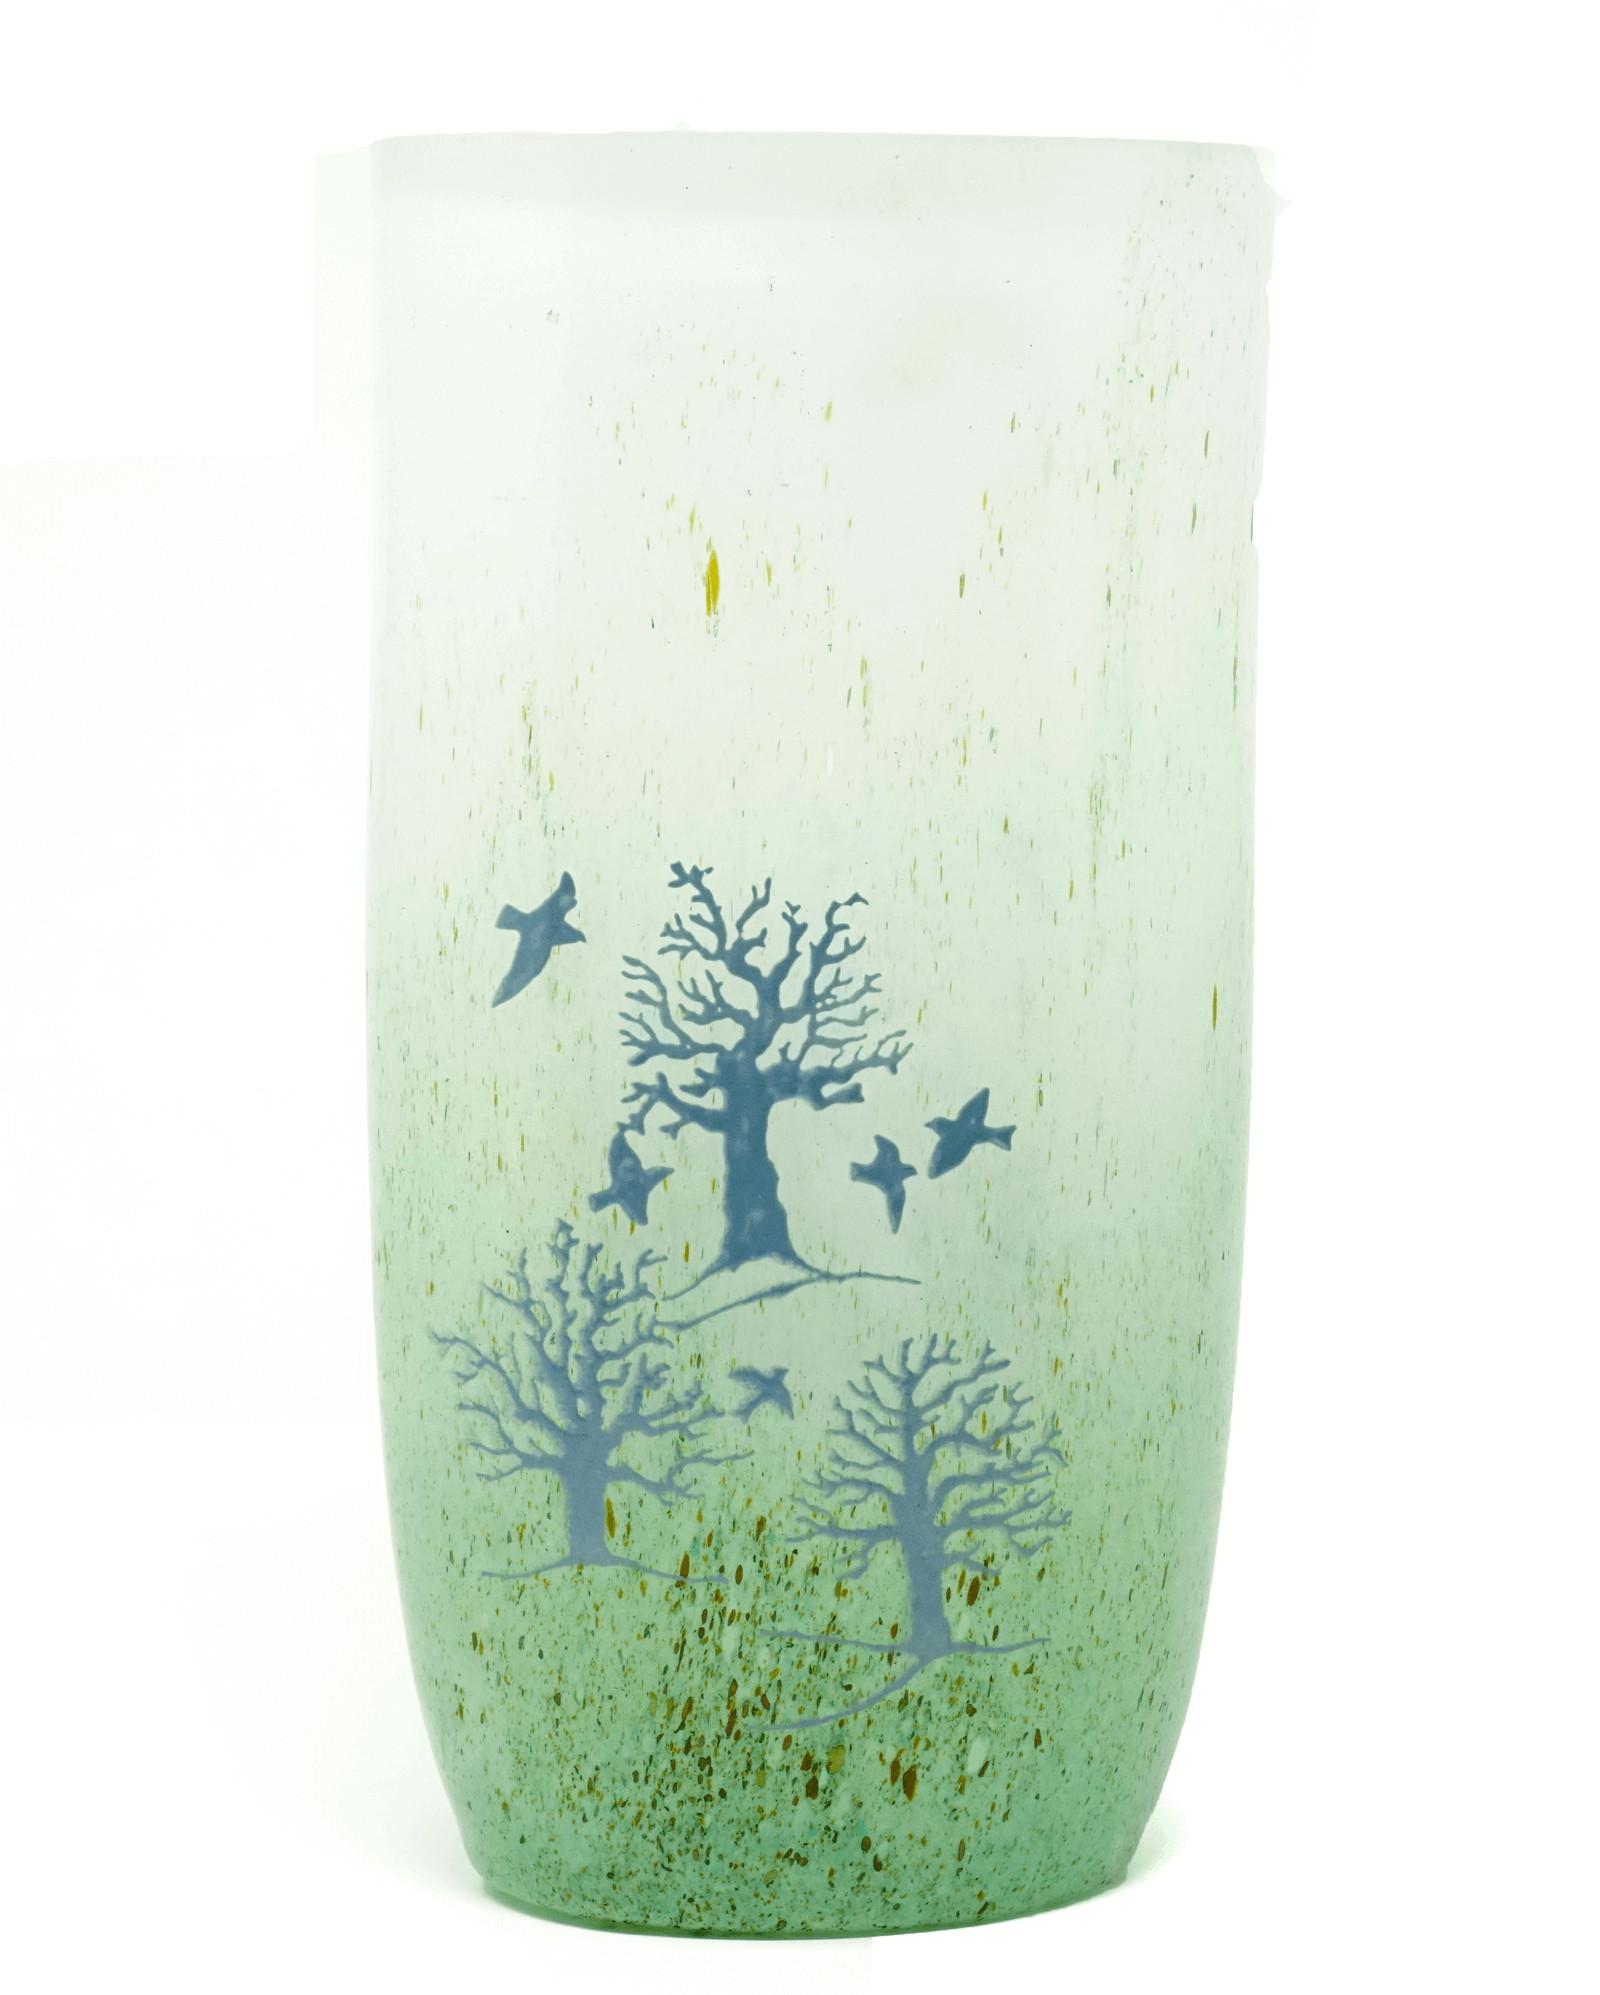 18 inch glass vase of kosta boda vase by kjell engman pinterest kosta boda and products inside kosta boda vase by kjell engman